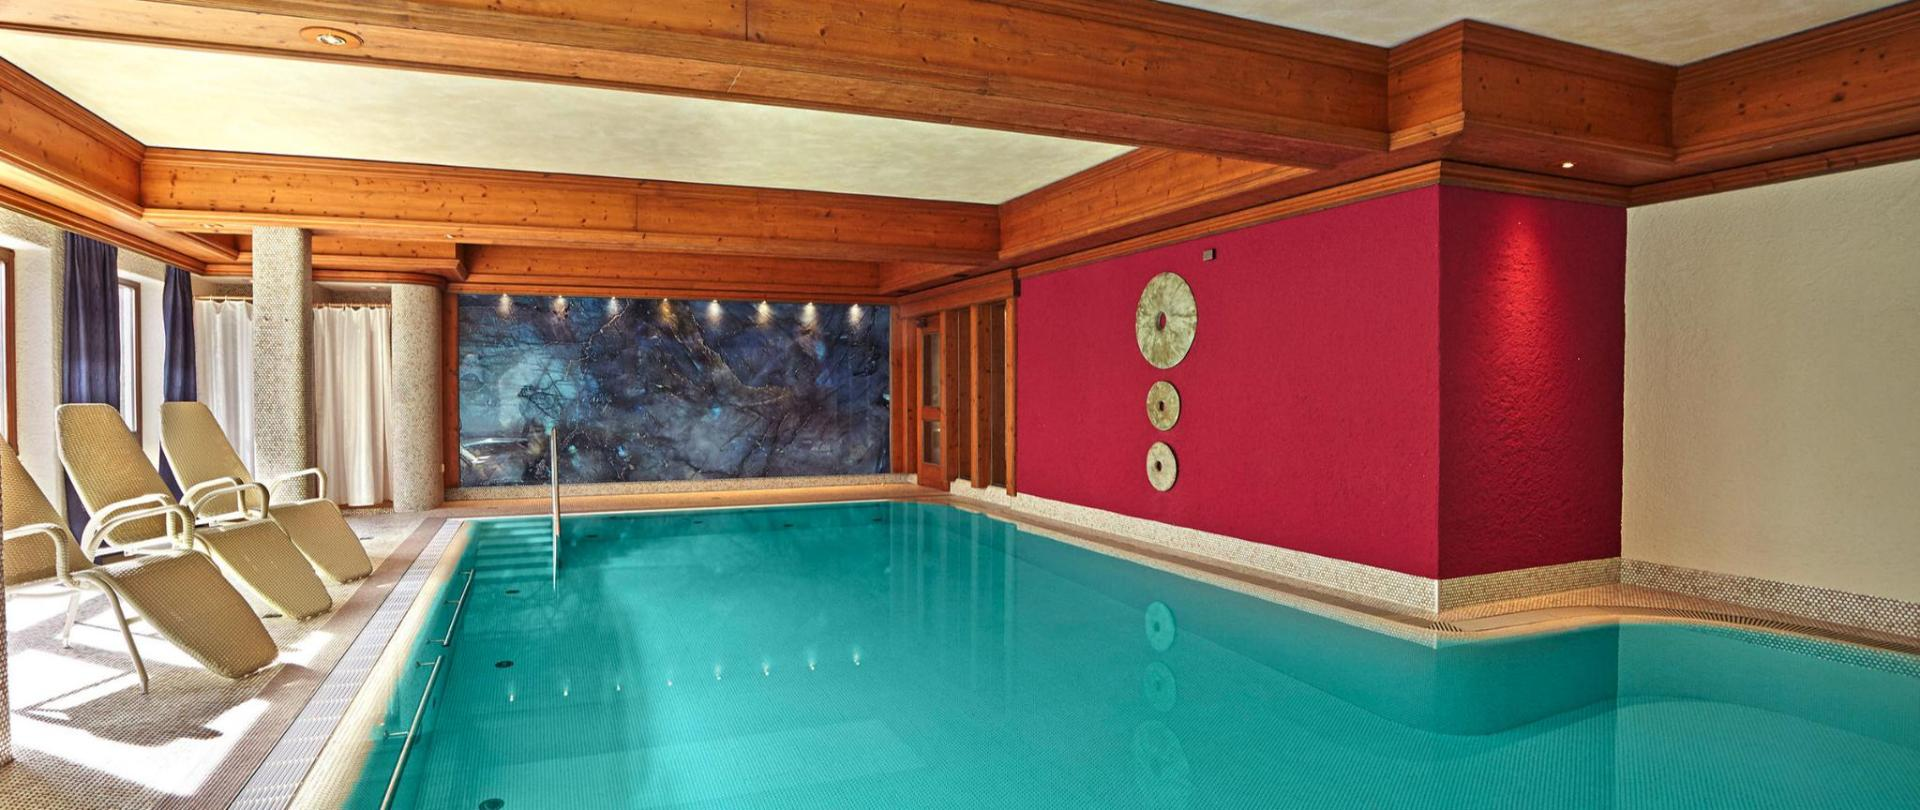 Pool, blaue Wand, mit Kurve.jpg